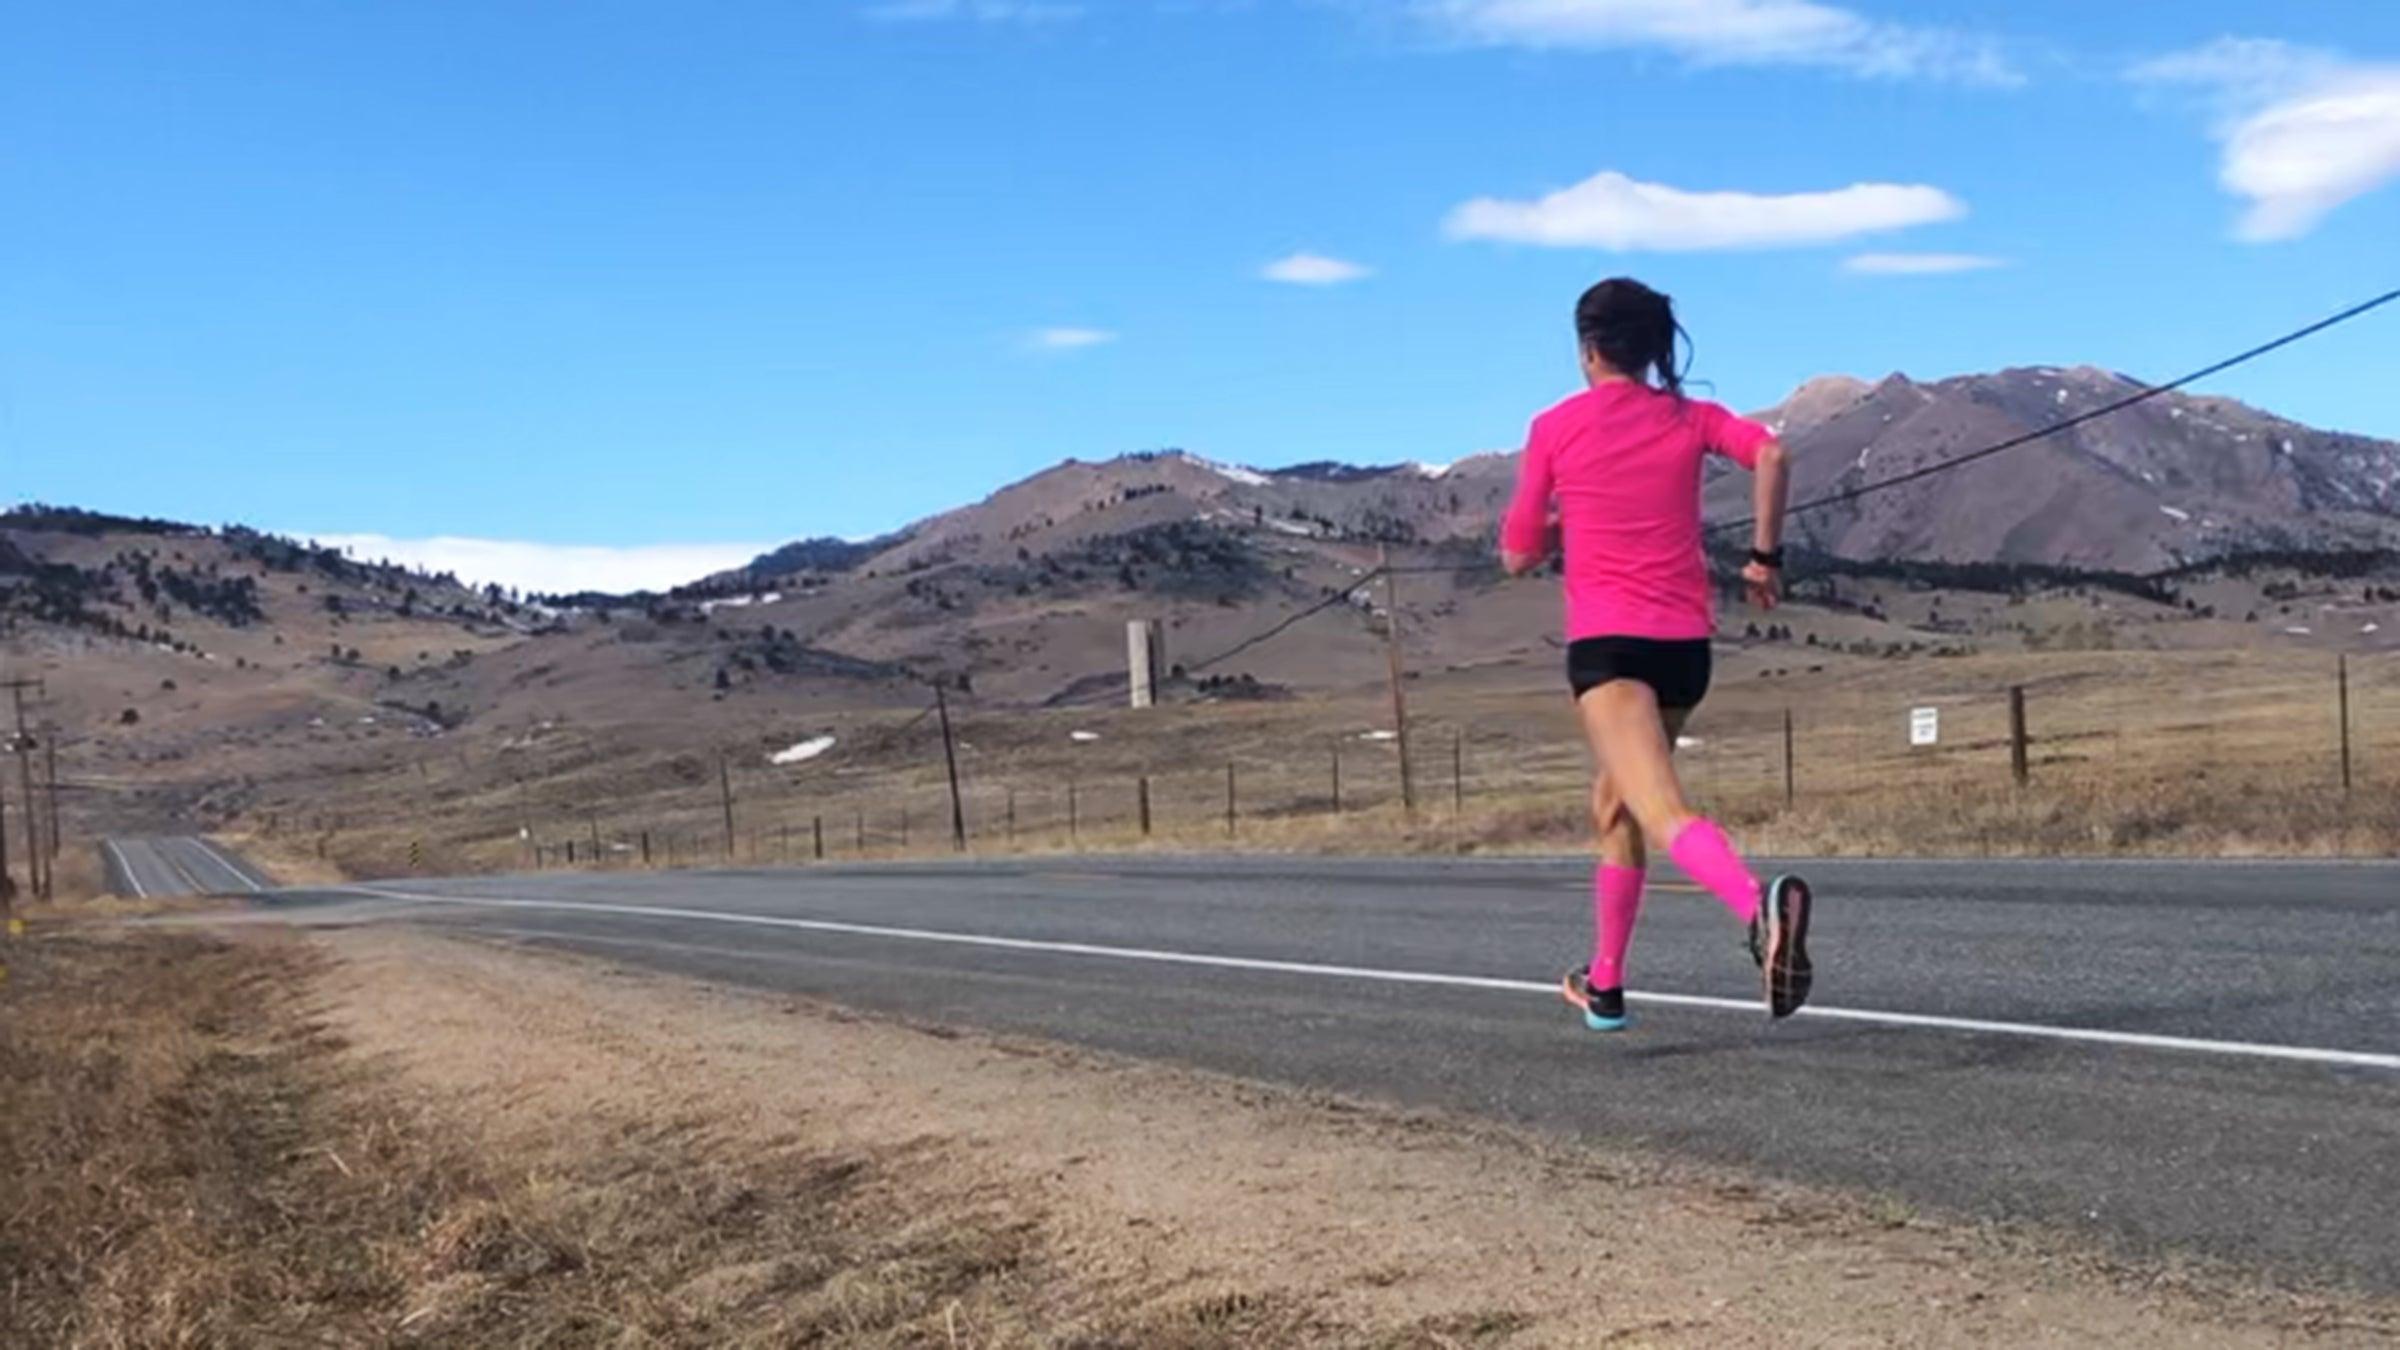 Lindsay Flanagan training on road